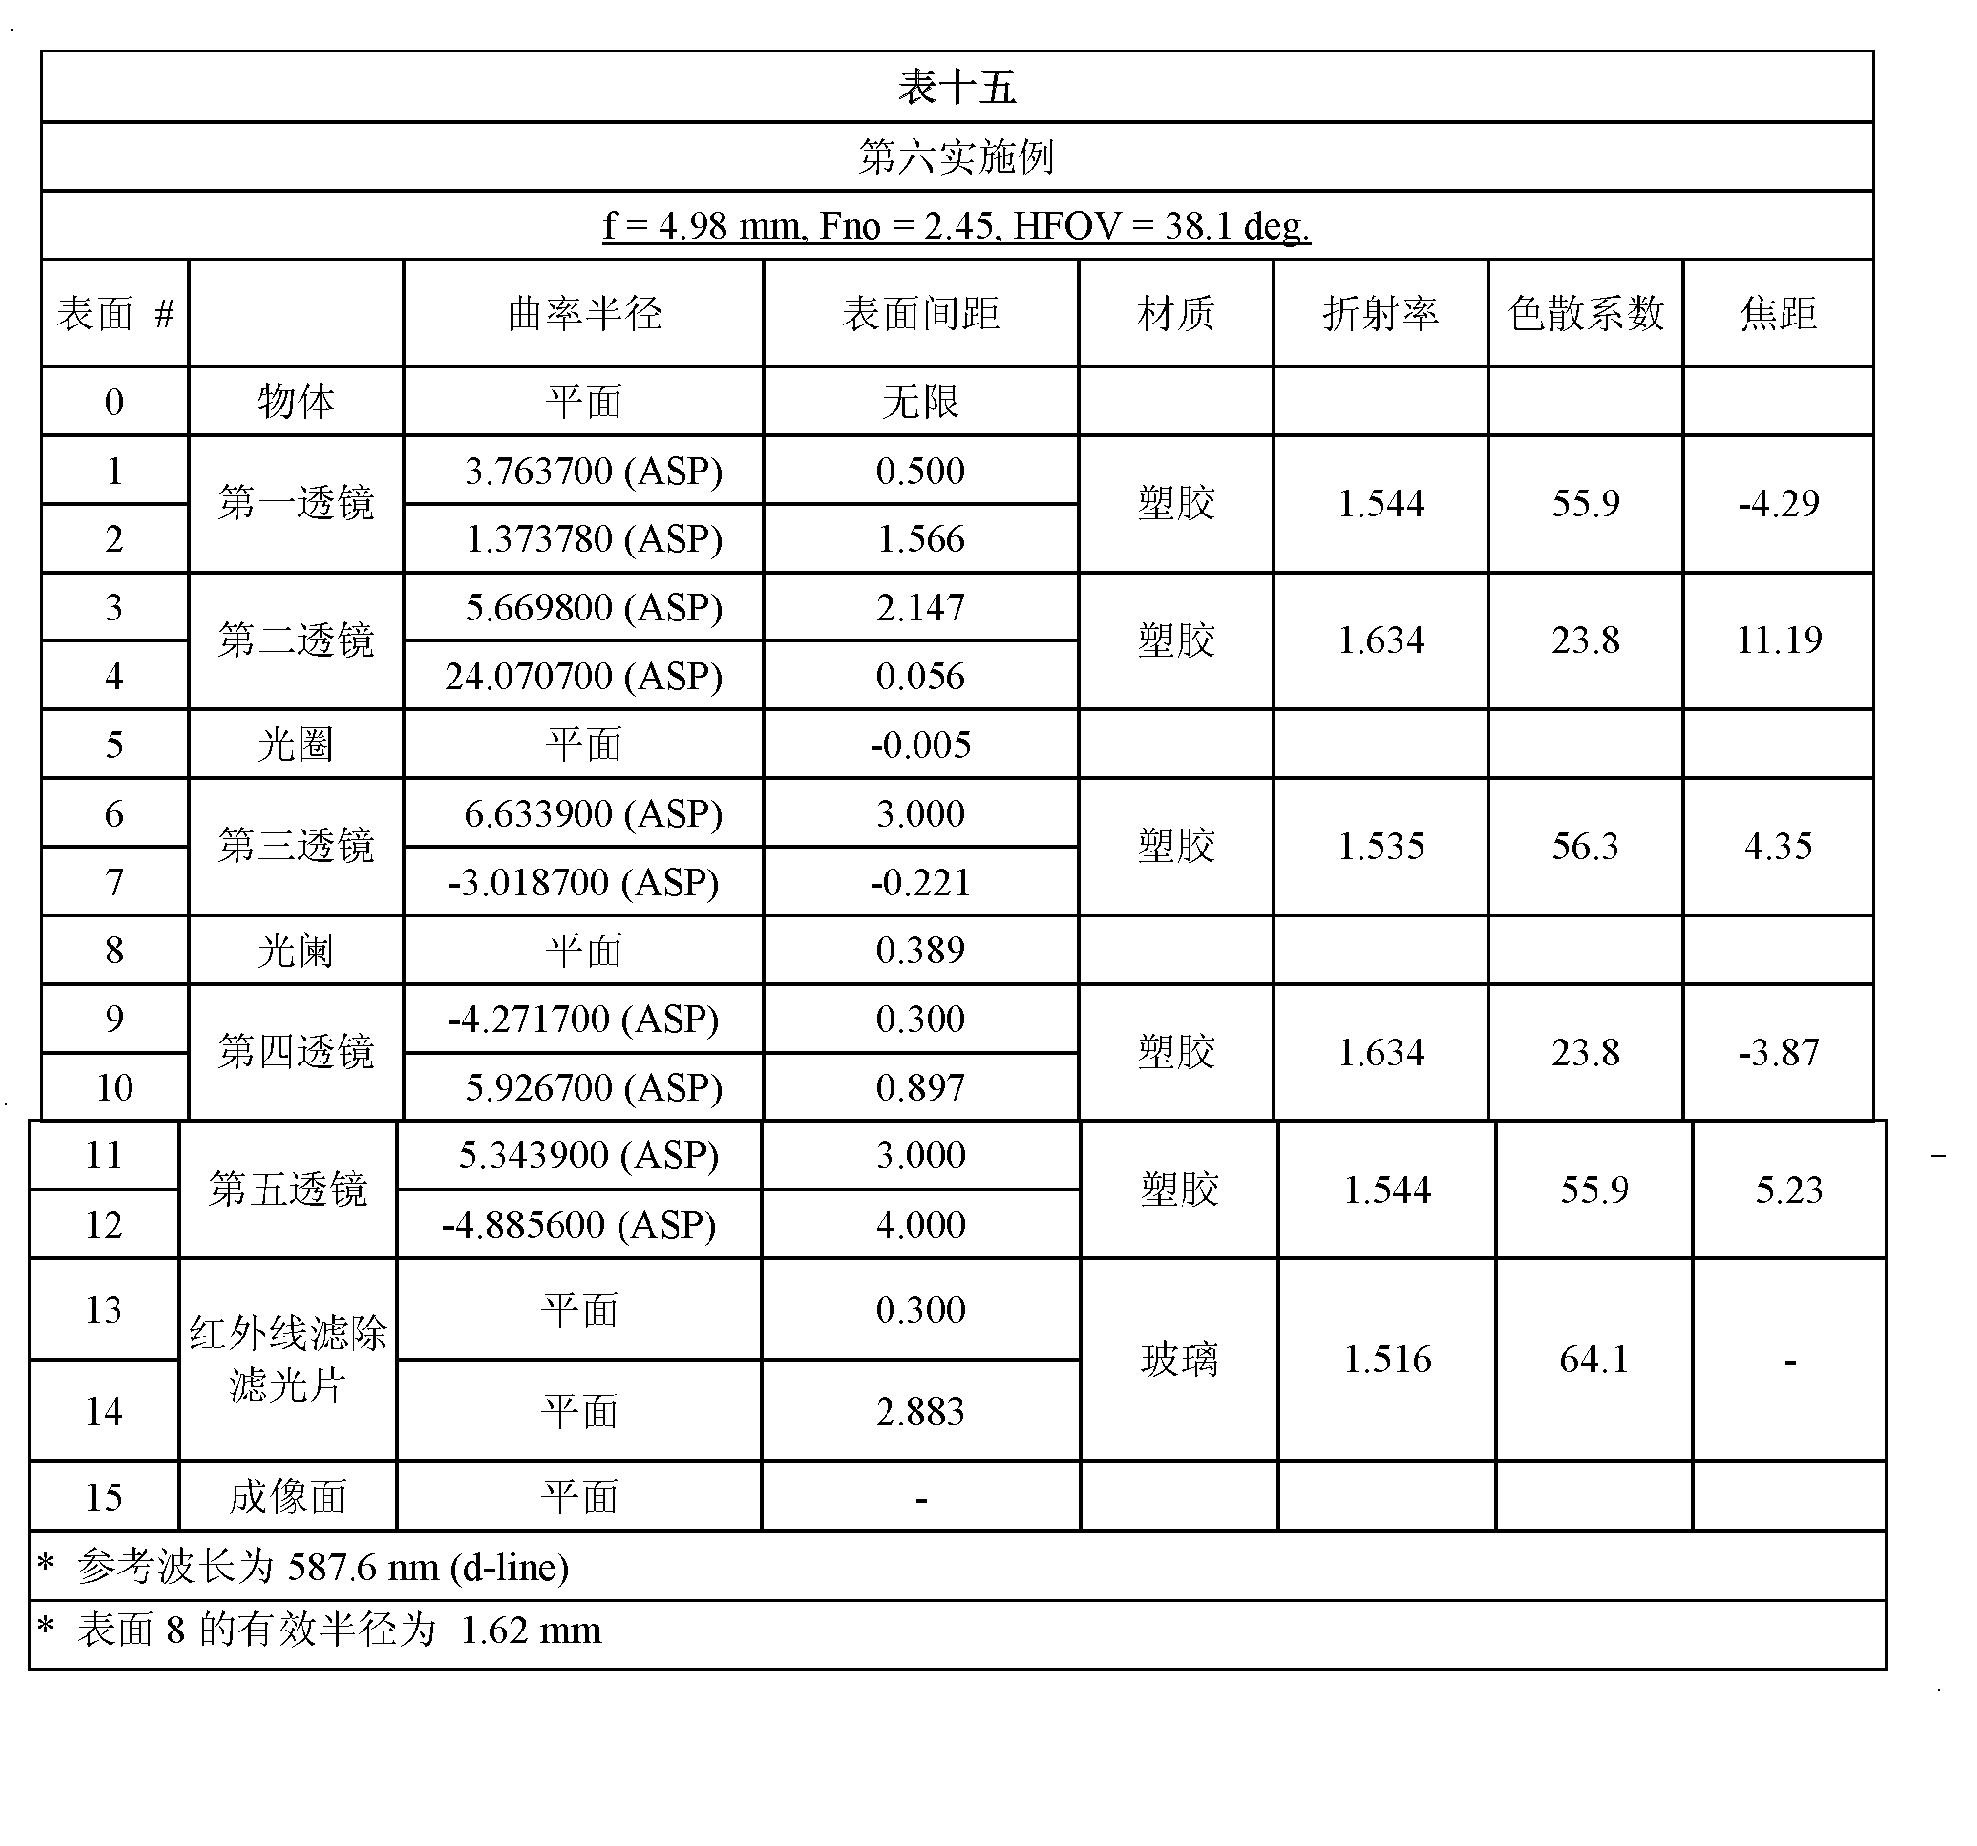 Figure CN202166776UD00201